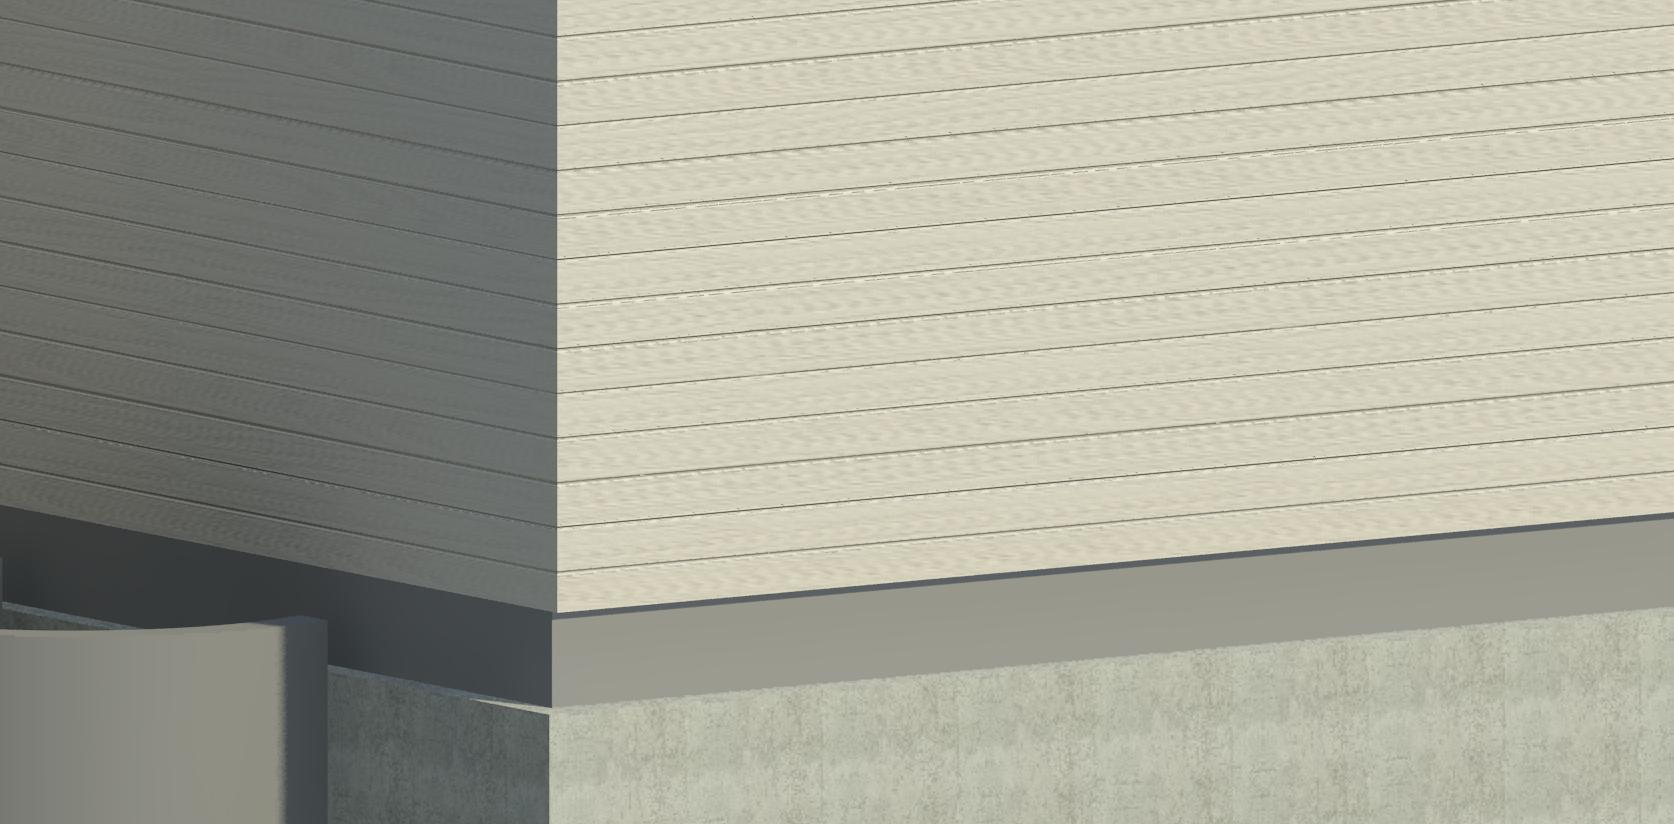 Solved Extending Siding Down To The Brick Ledge Or Ledge